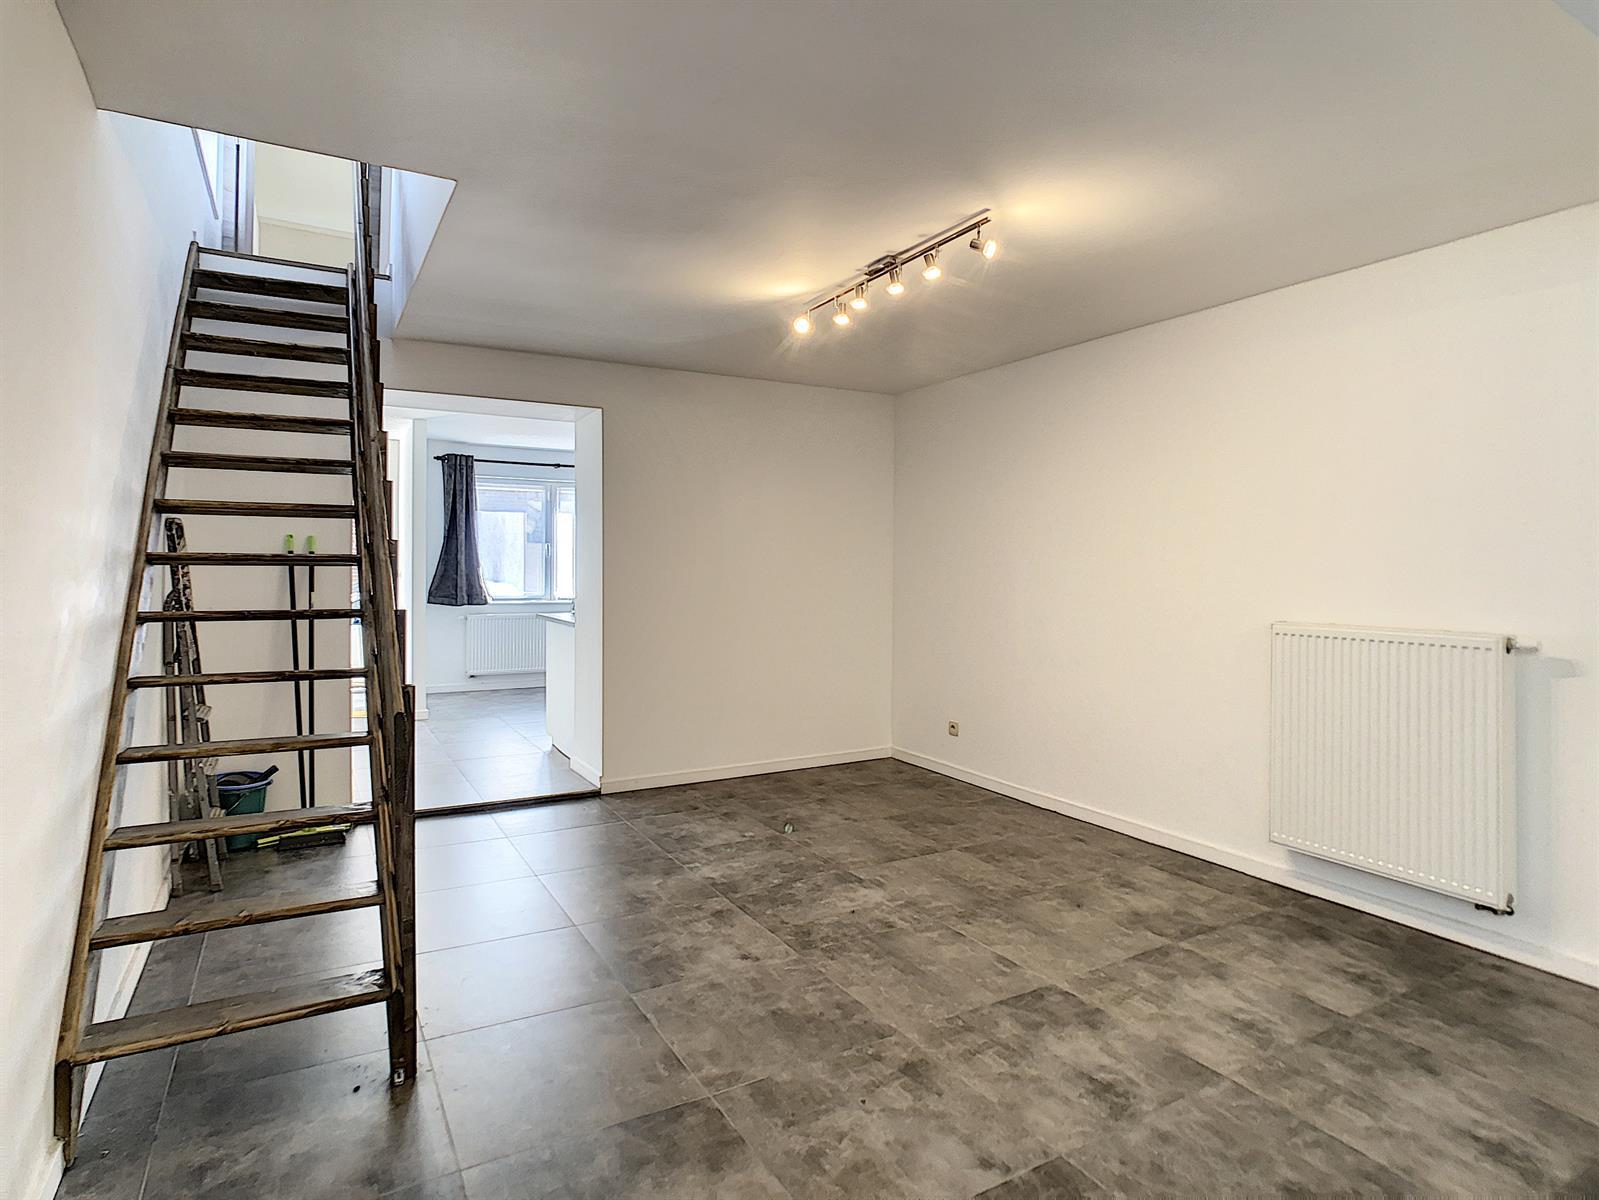 Maison - Charleroi Couillet - #4444227-7